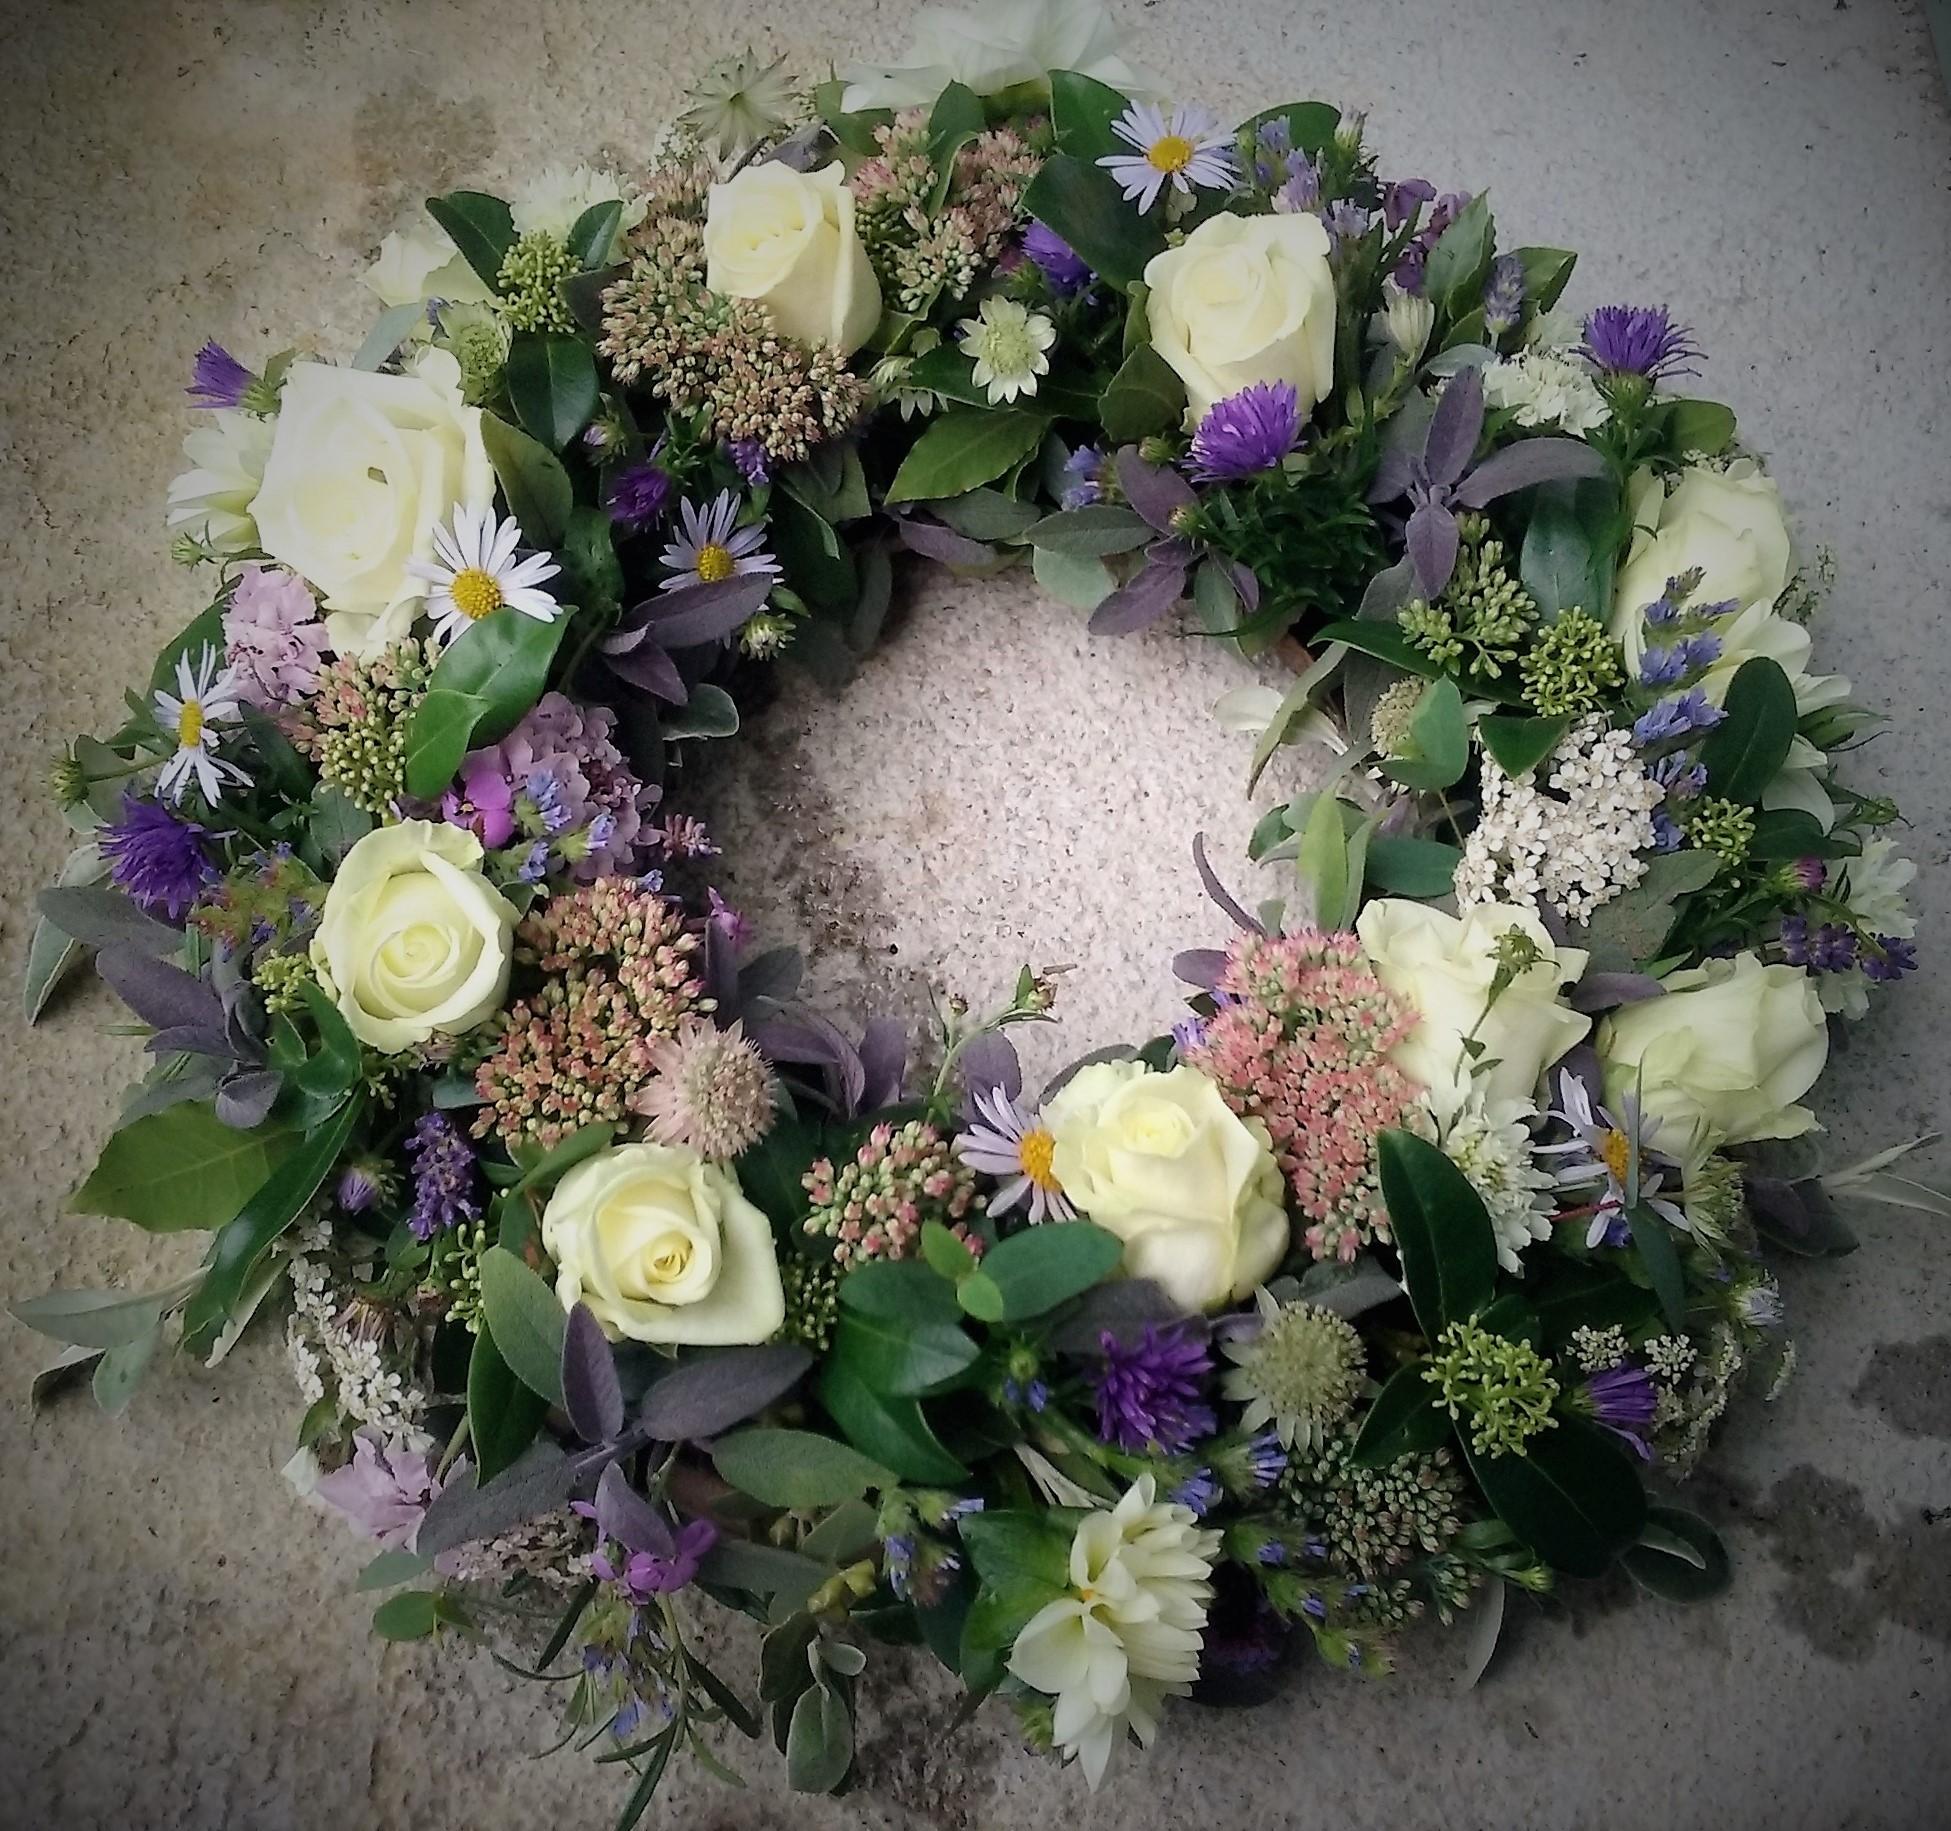 Funeral remembrance flowers the secret garden cork kerry funeral remembrance flowers the secret garden cork kerry munster izmirmasajfo